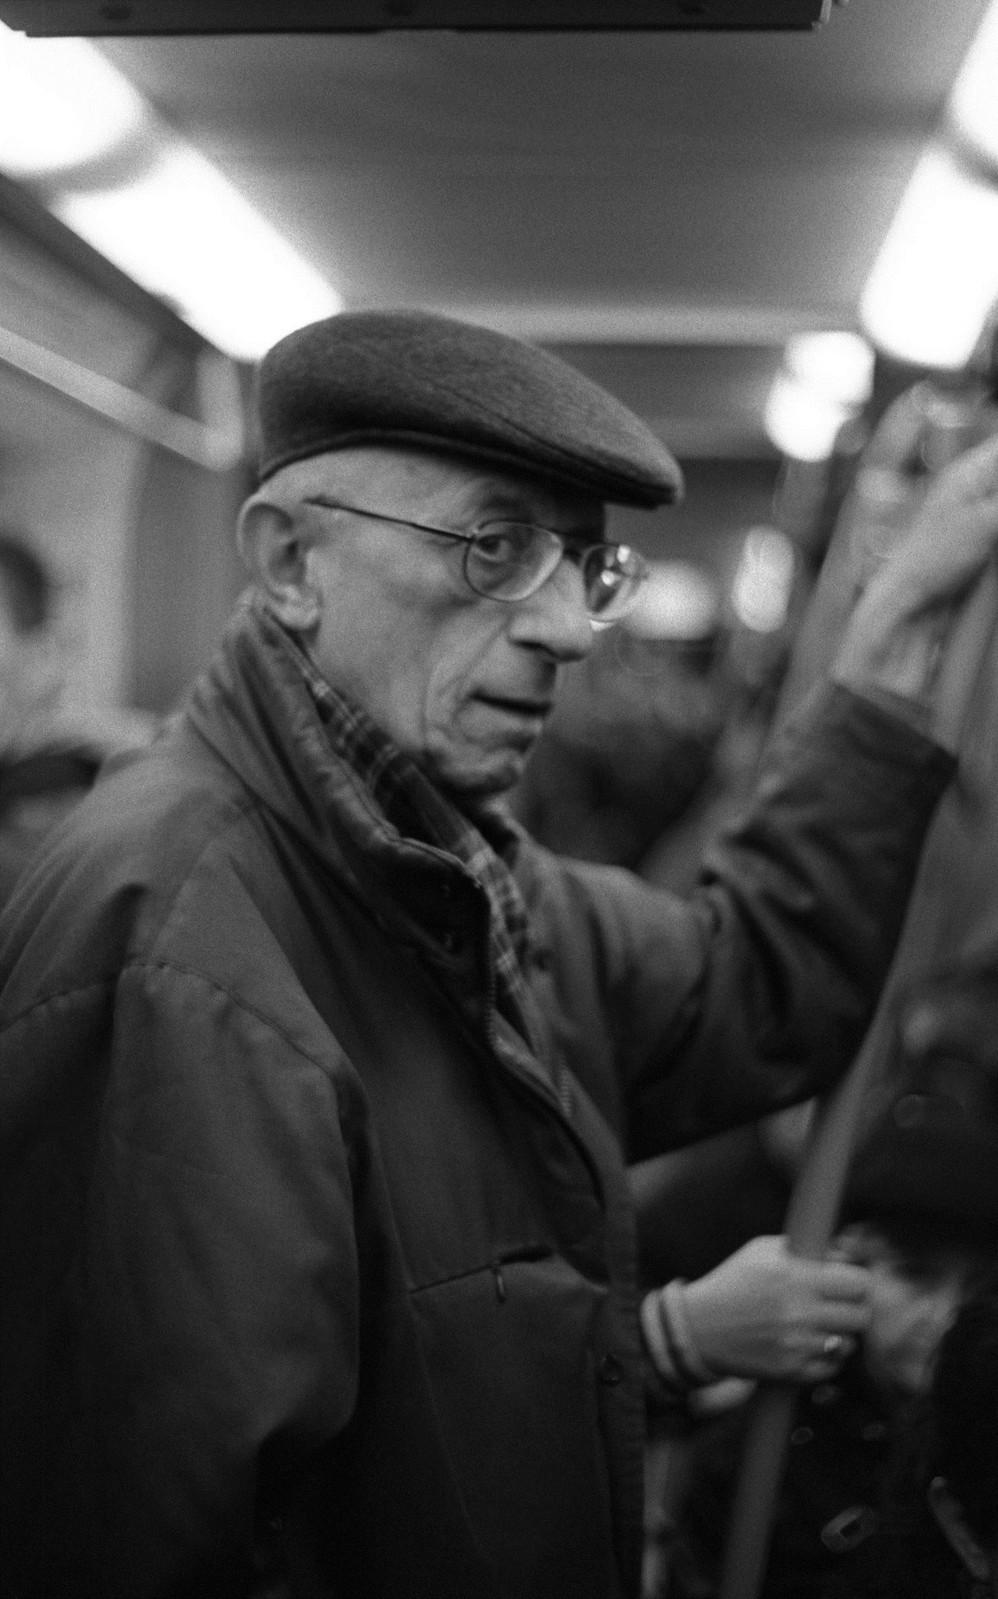 Praktica BC1 - Interesting Man in the Tram